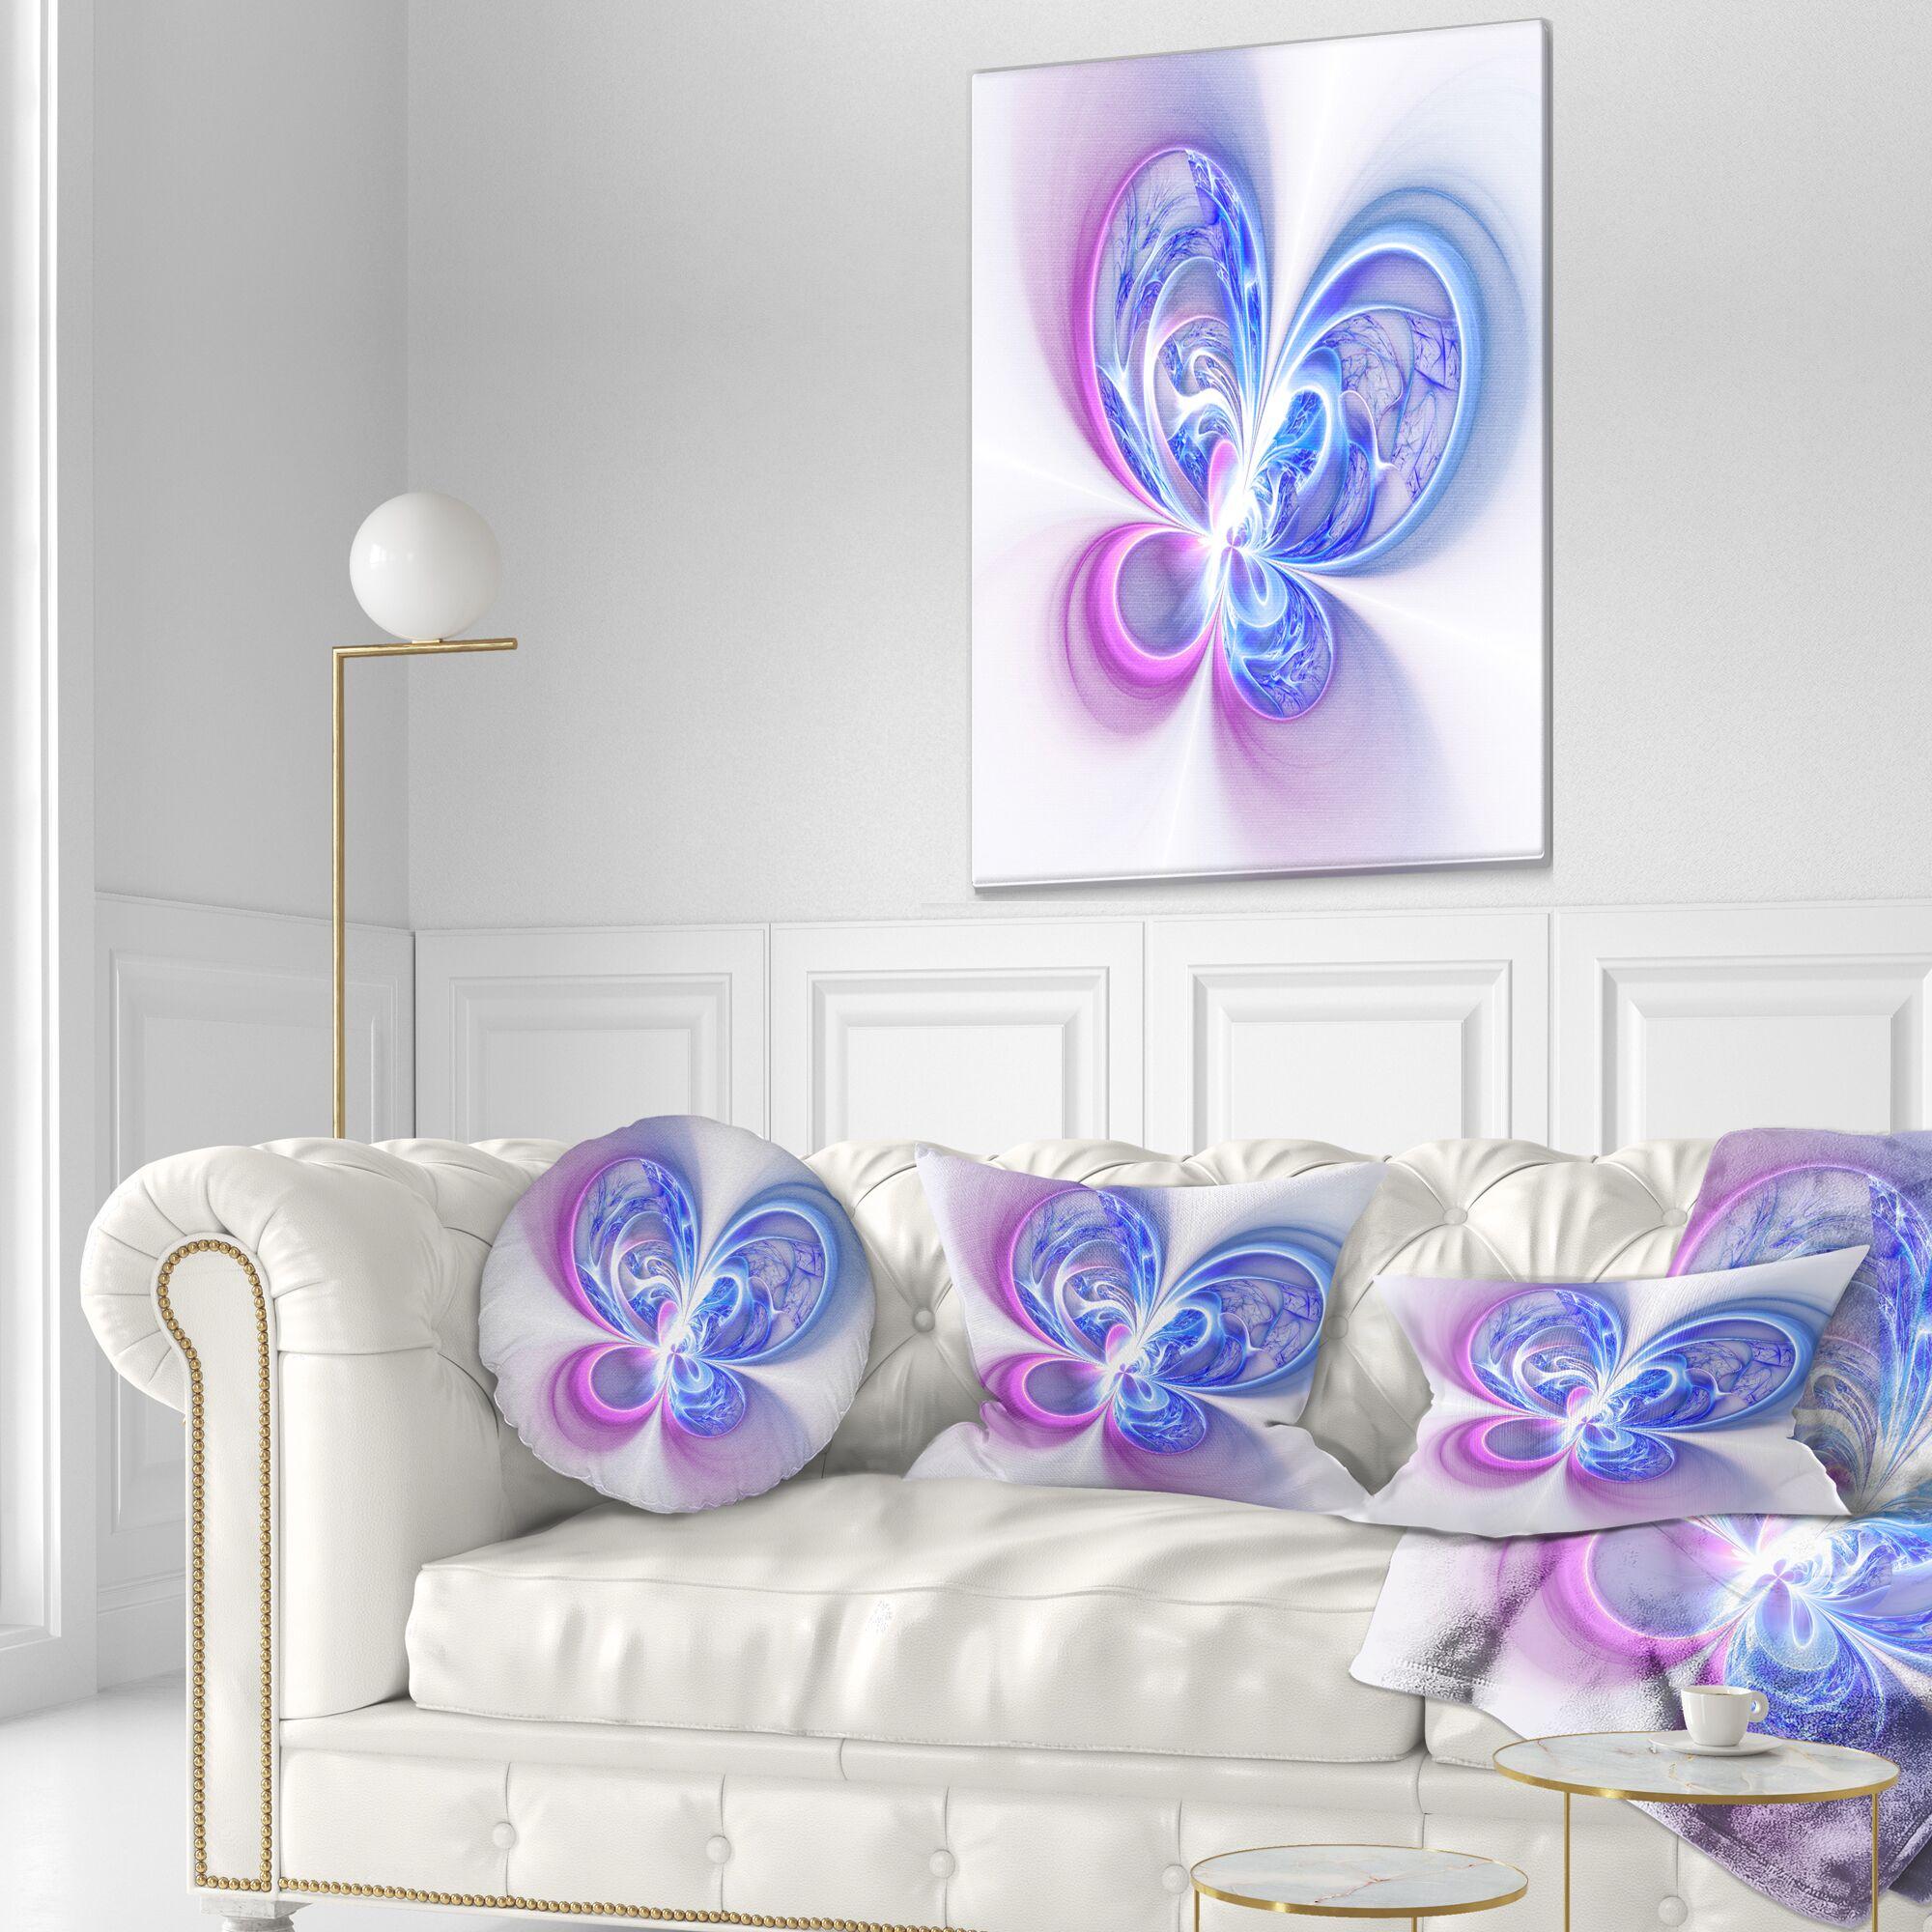 Floral Shiny Digital Fractal Flower Lumbar Pillow